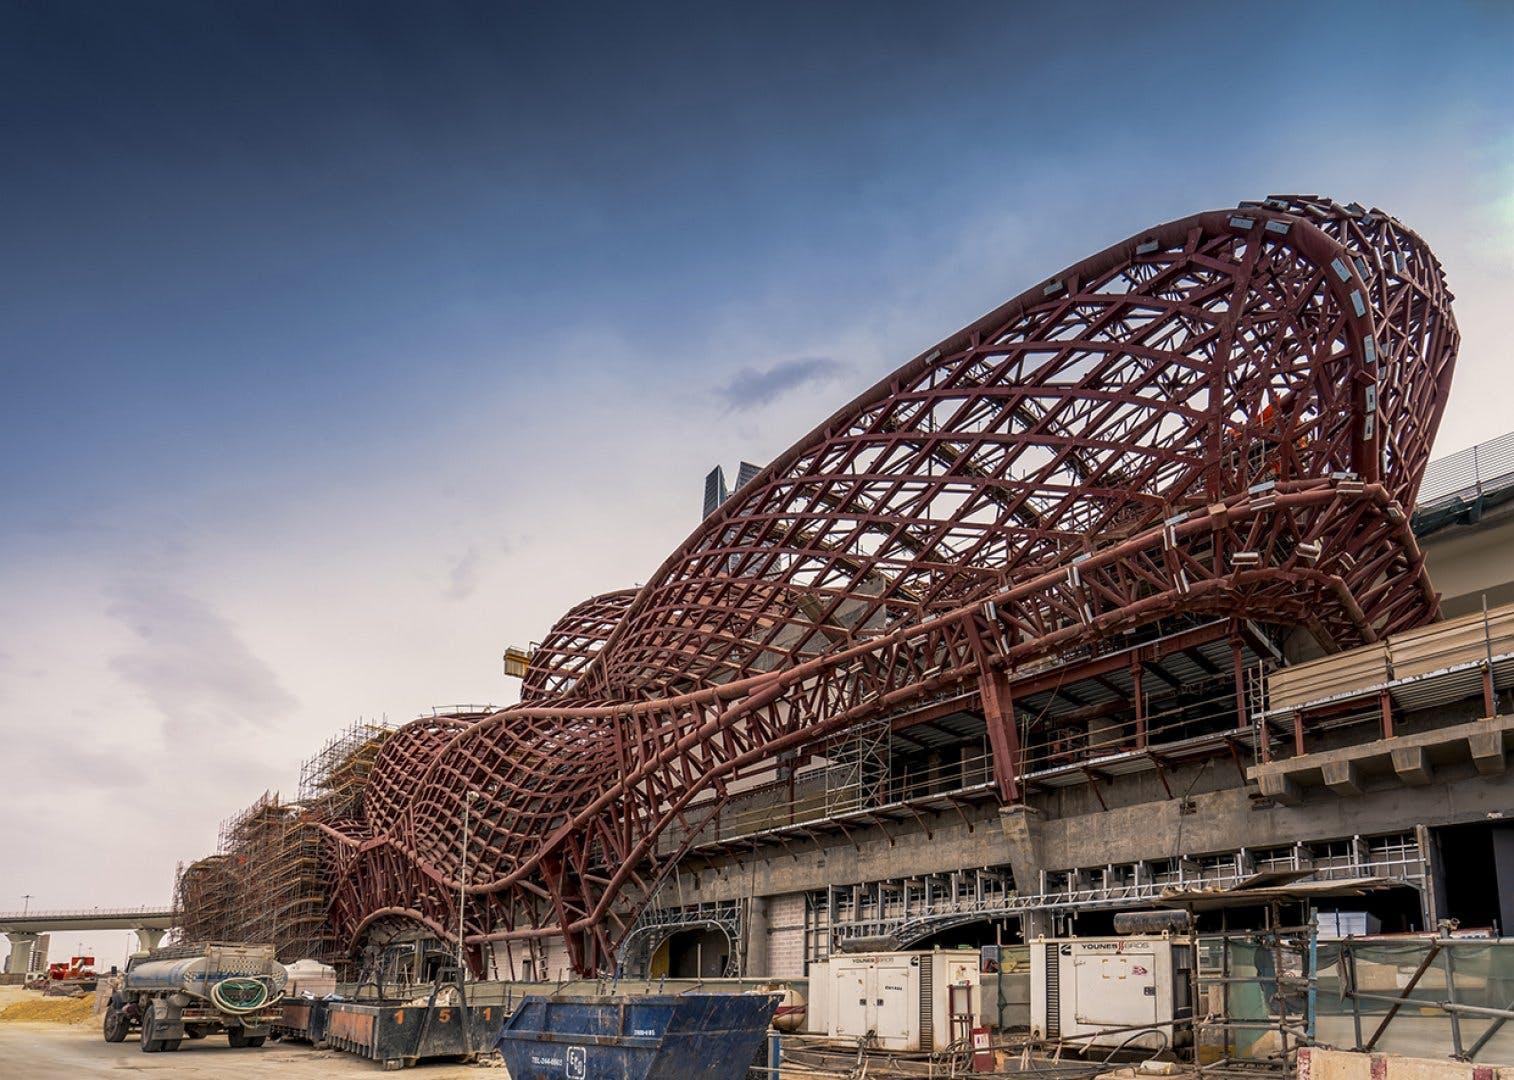 New construction photos of Zaha Hadid Architects-designed